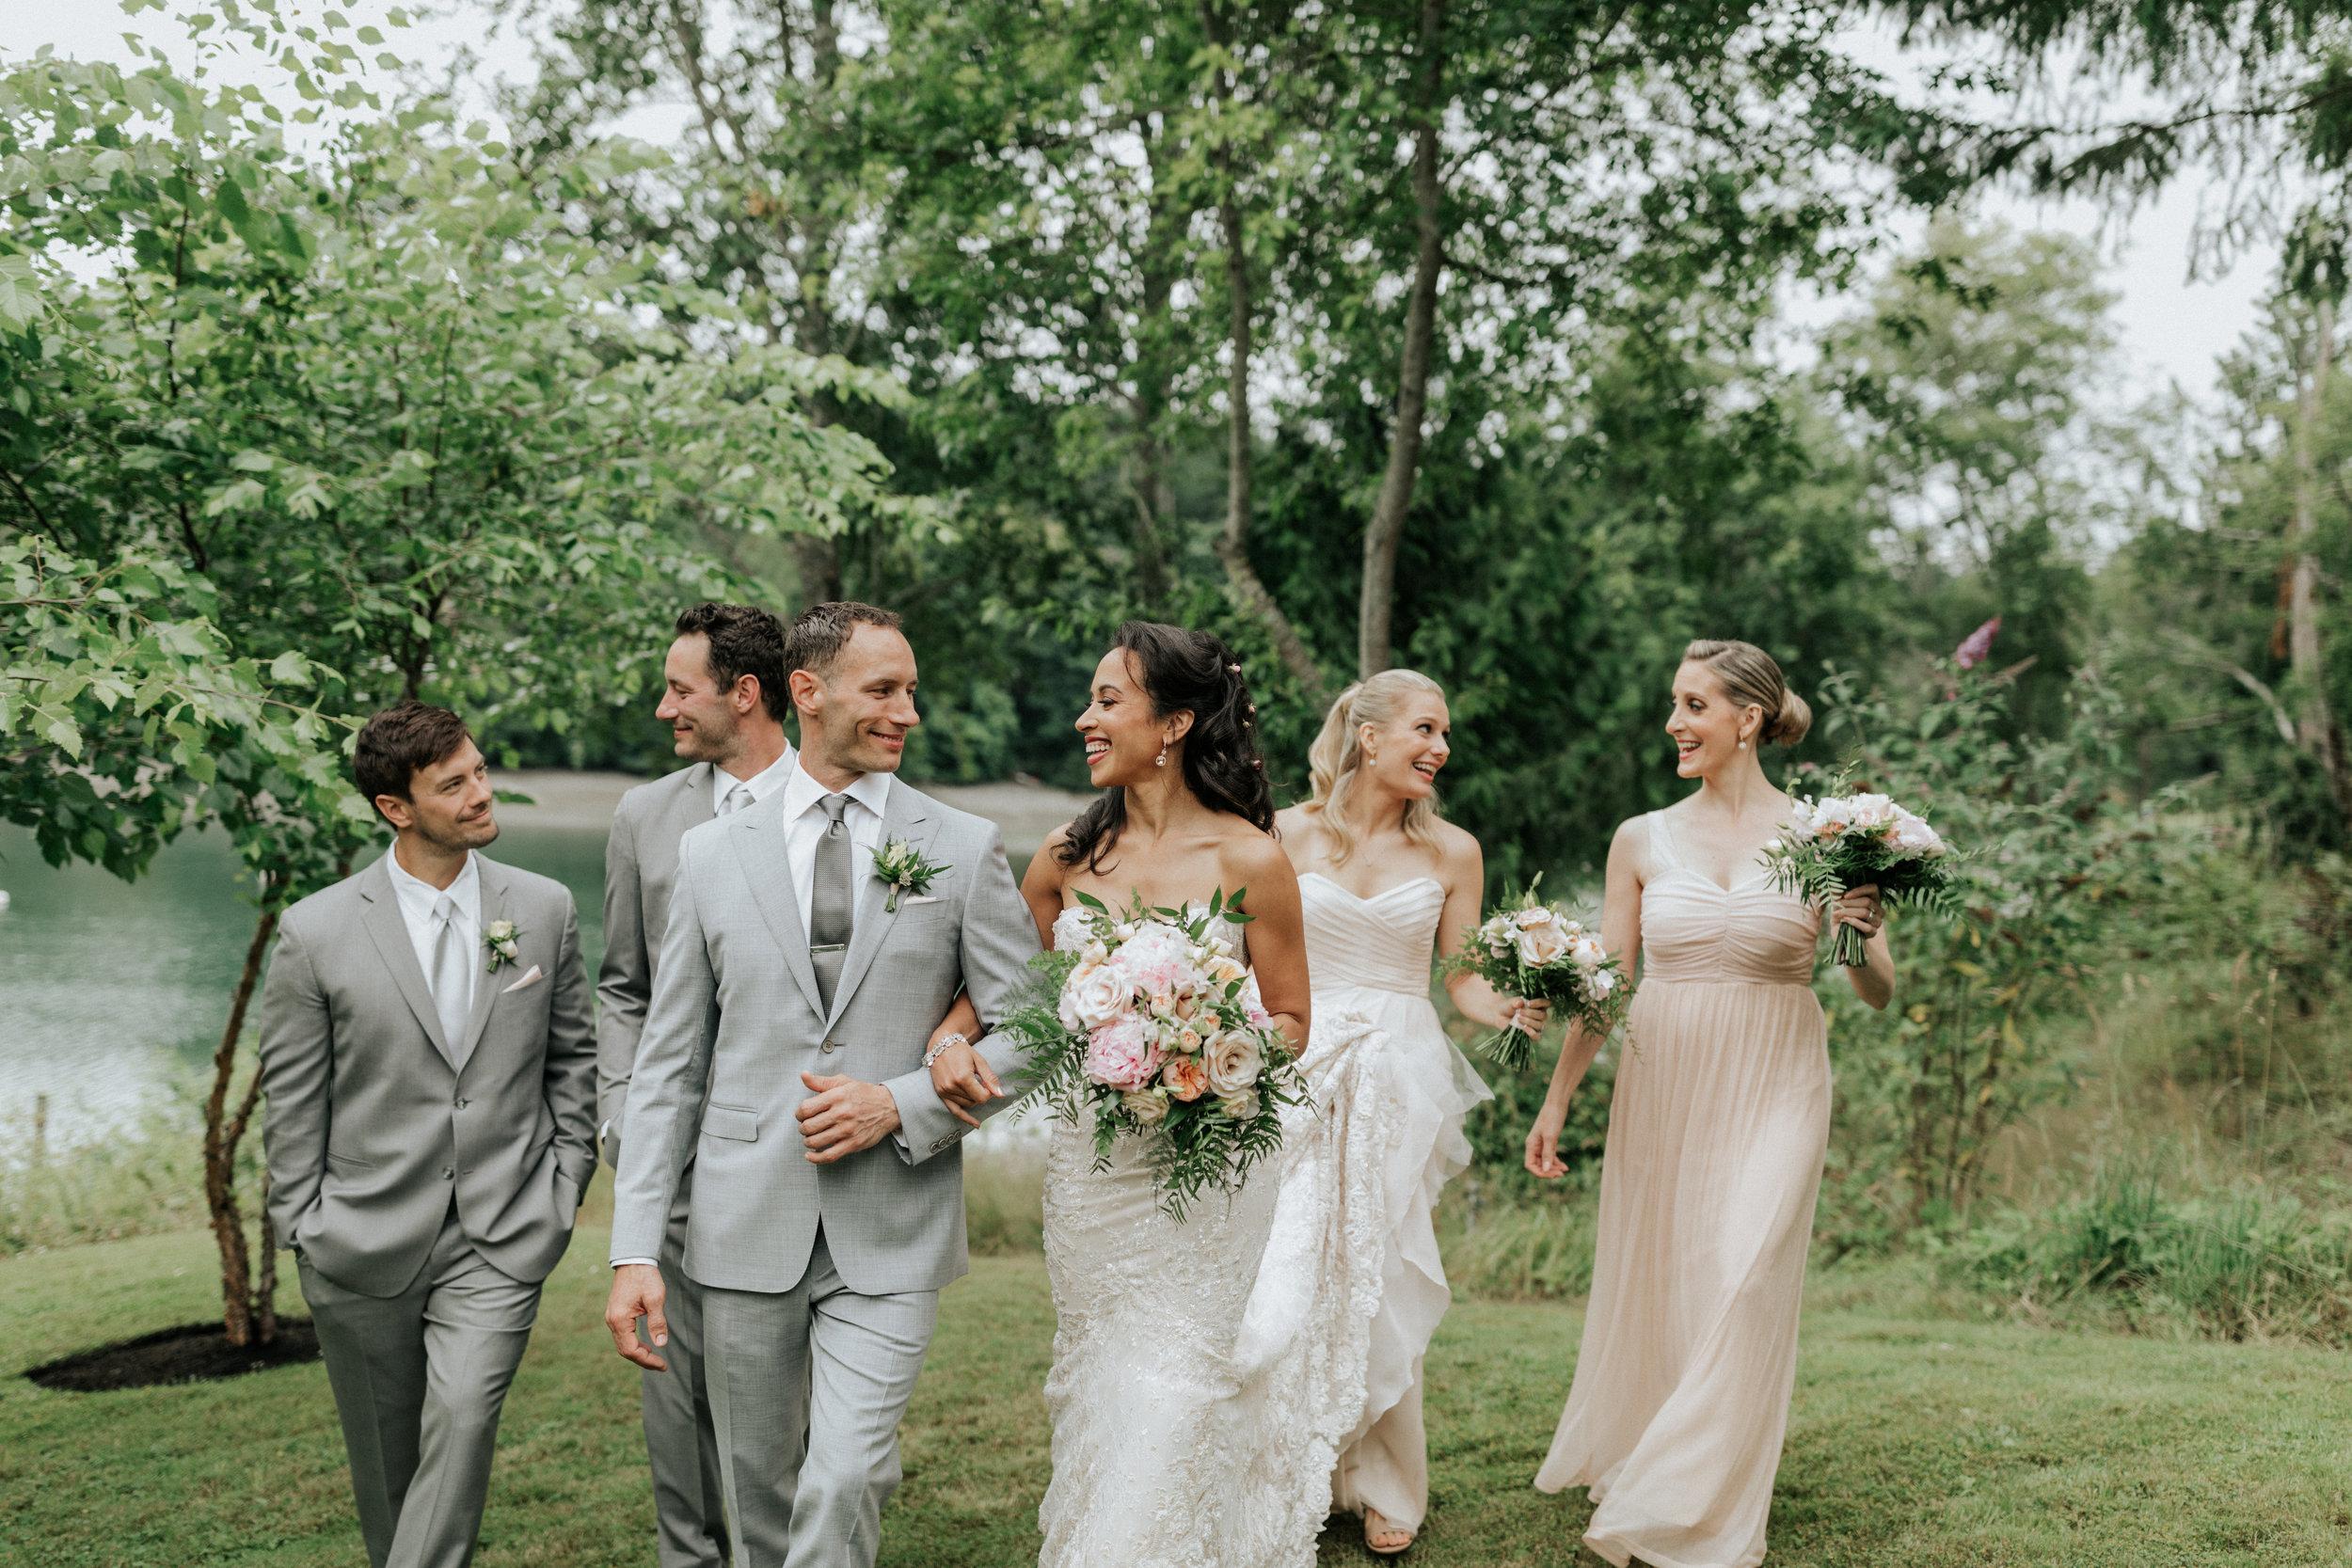 EmilyKeeneyPhotography_Sara+Ryan_7.2019-340.jpg